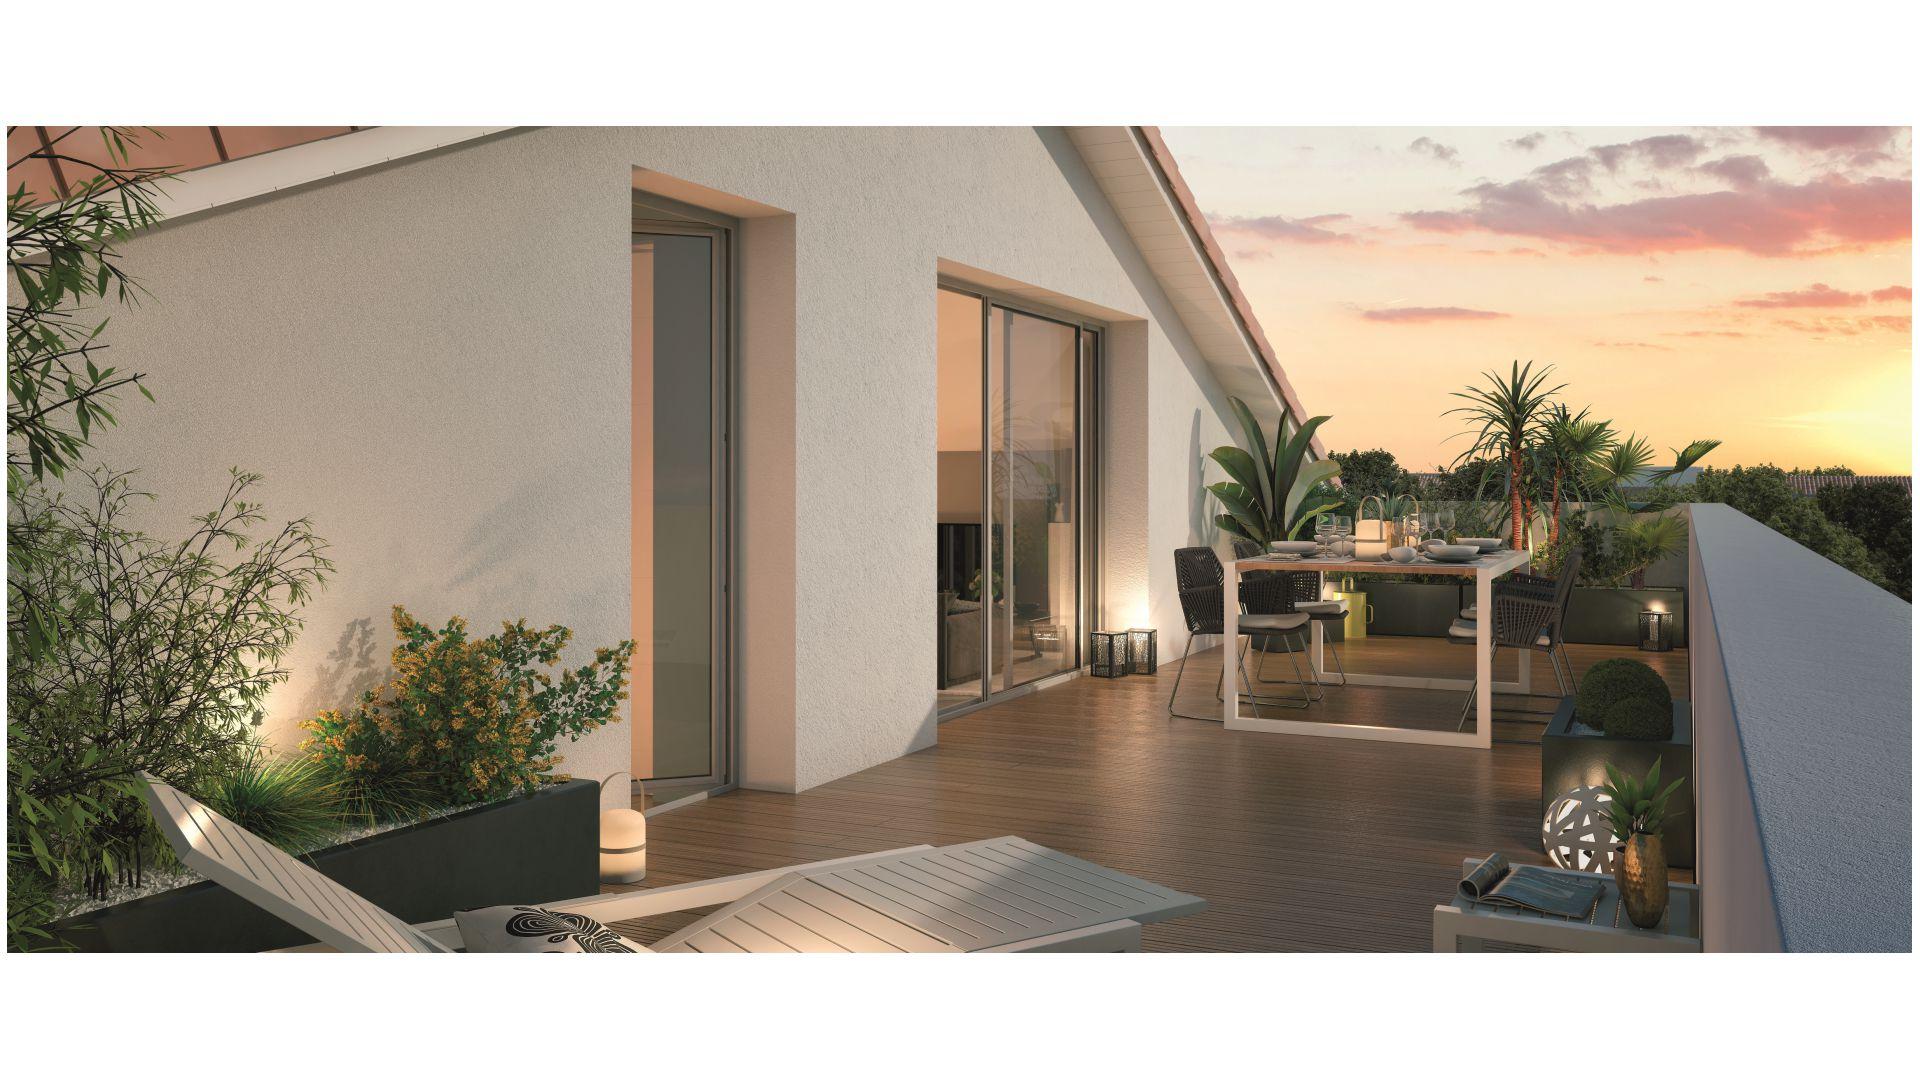 Greencity Immobilier - Le Bogey - Toulouse Saint-Simon 31100- Terrasse appartement T4